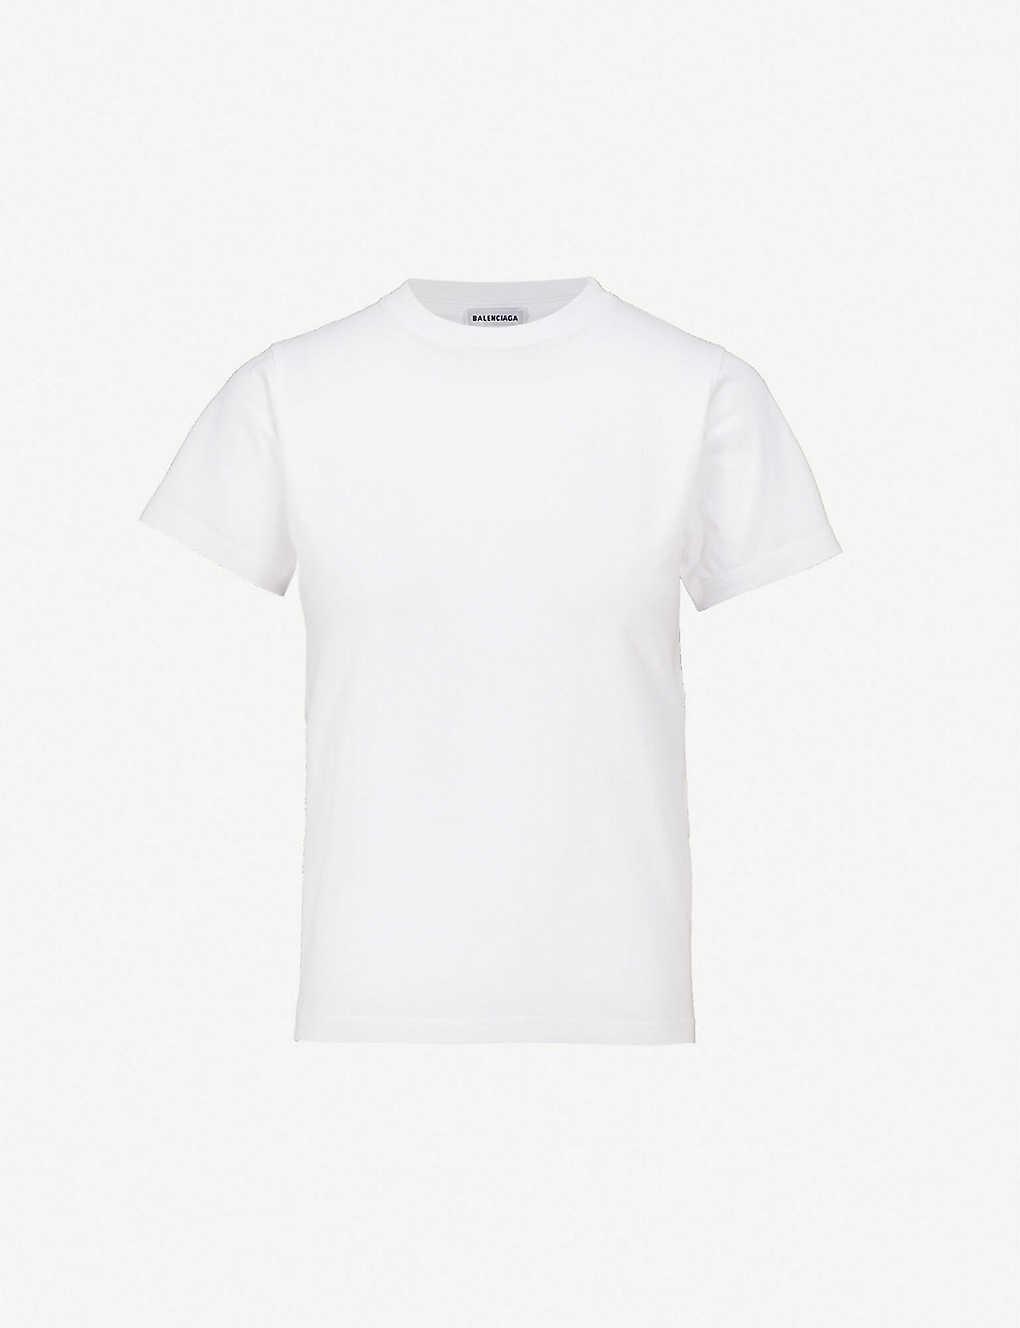 b04375cbf963 BALENCIAGA - Ego-print cotton-jersey T-shirt | Selfridges.com